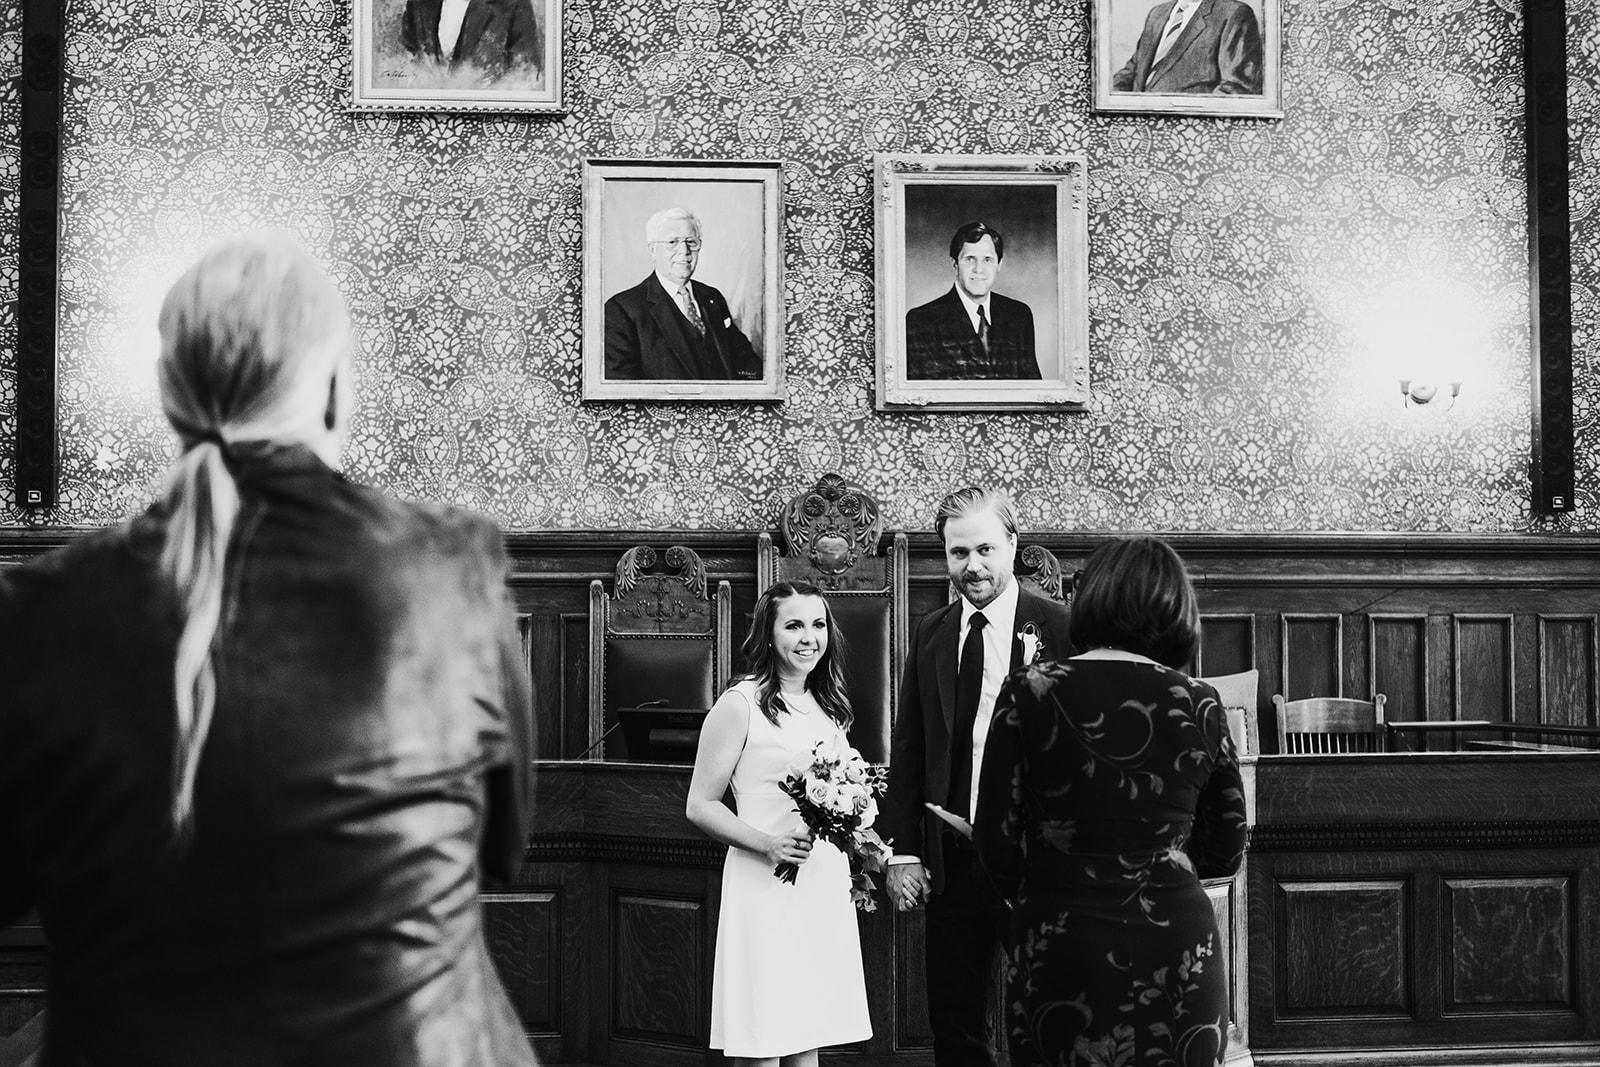 Wedding_Francis_Boucher_Elopement_Cambridge_MA_2018-43.jpg